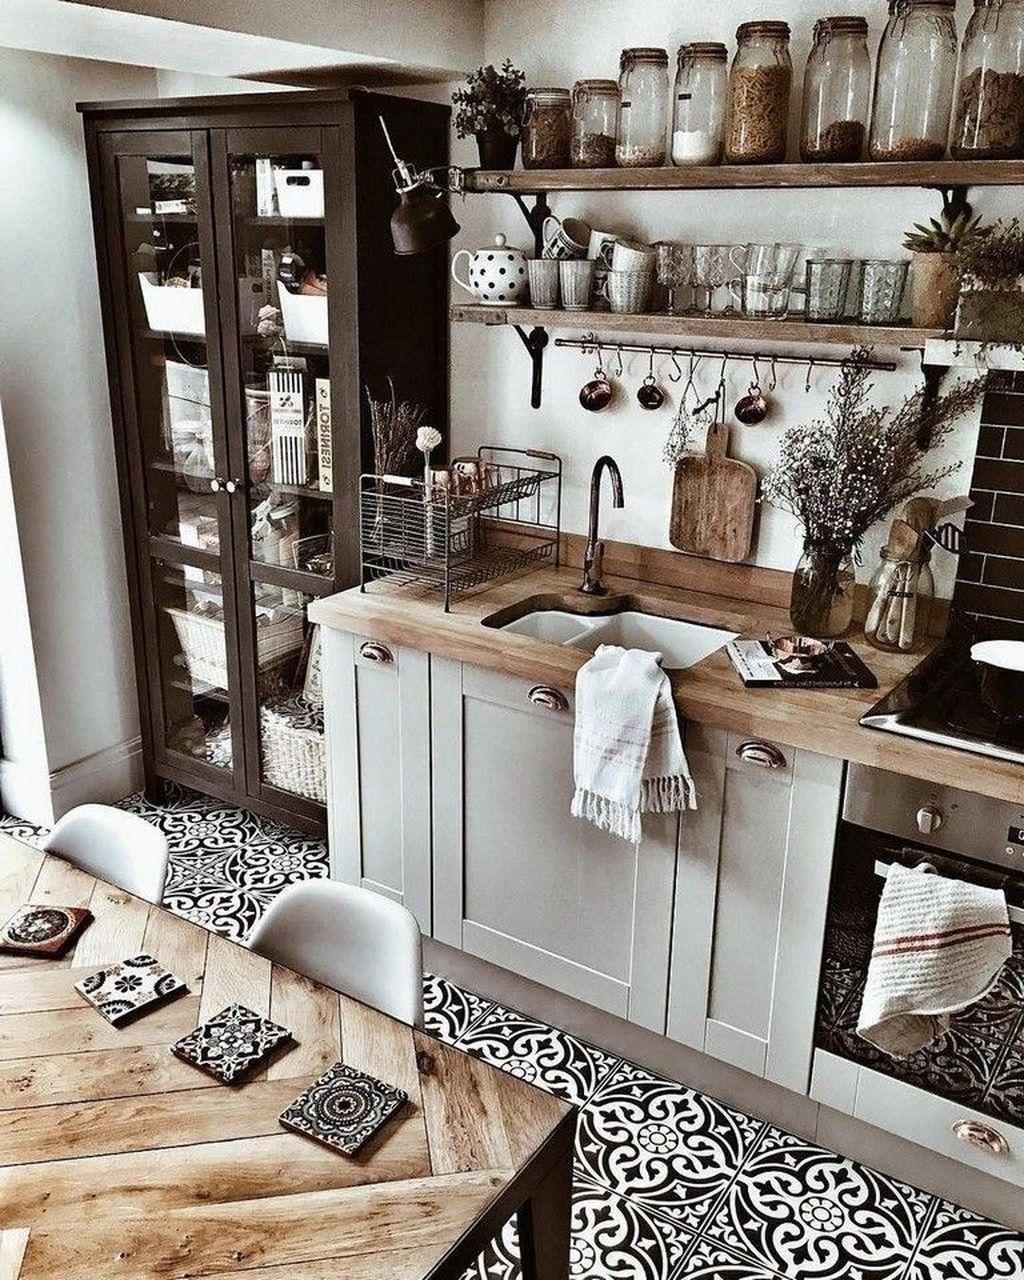 The Best Farmhouse Kitchen Decor Ideas 08